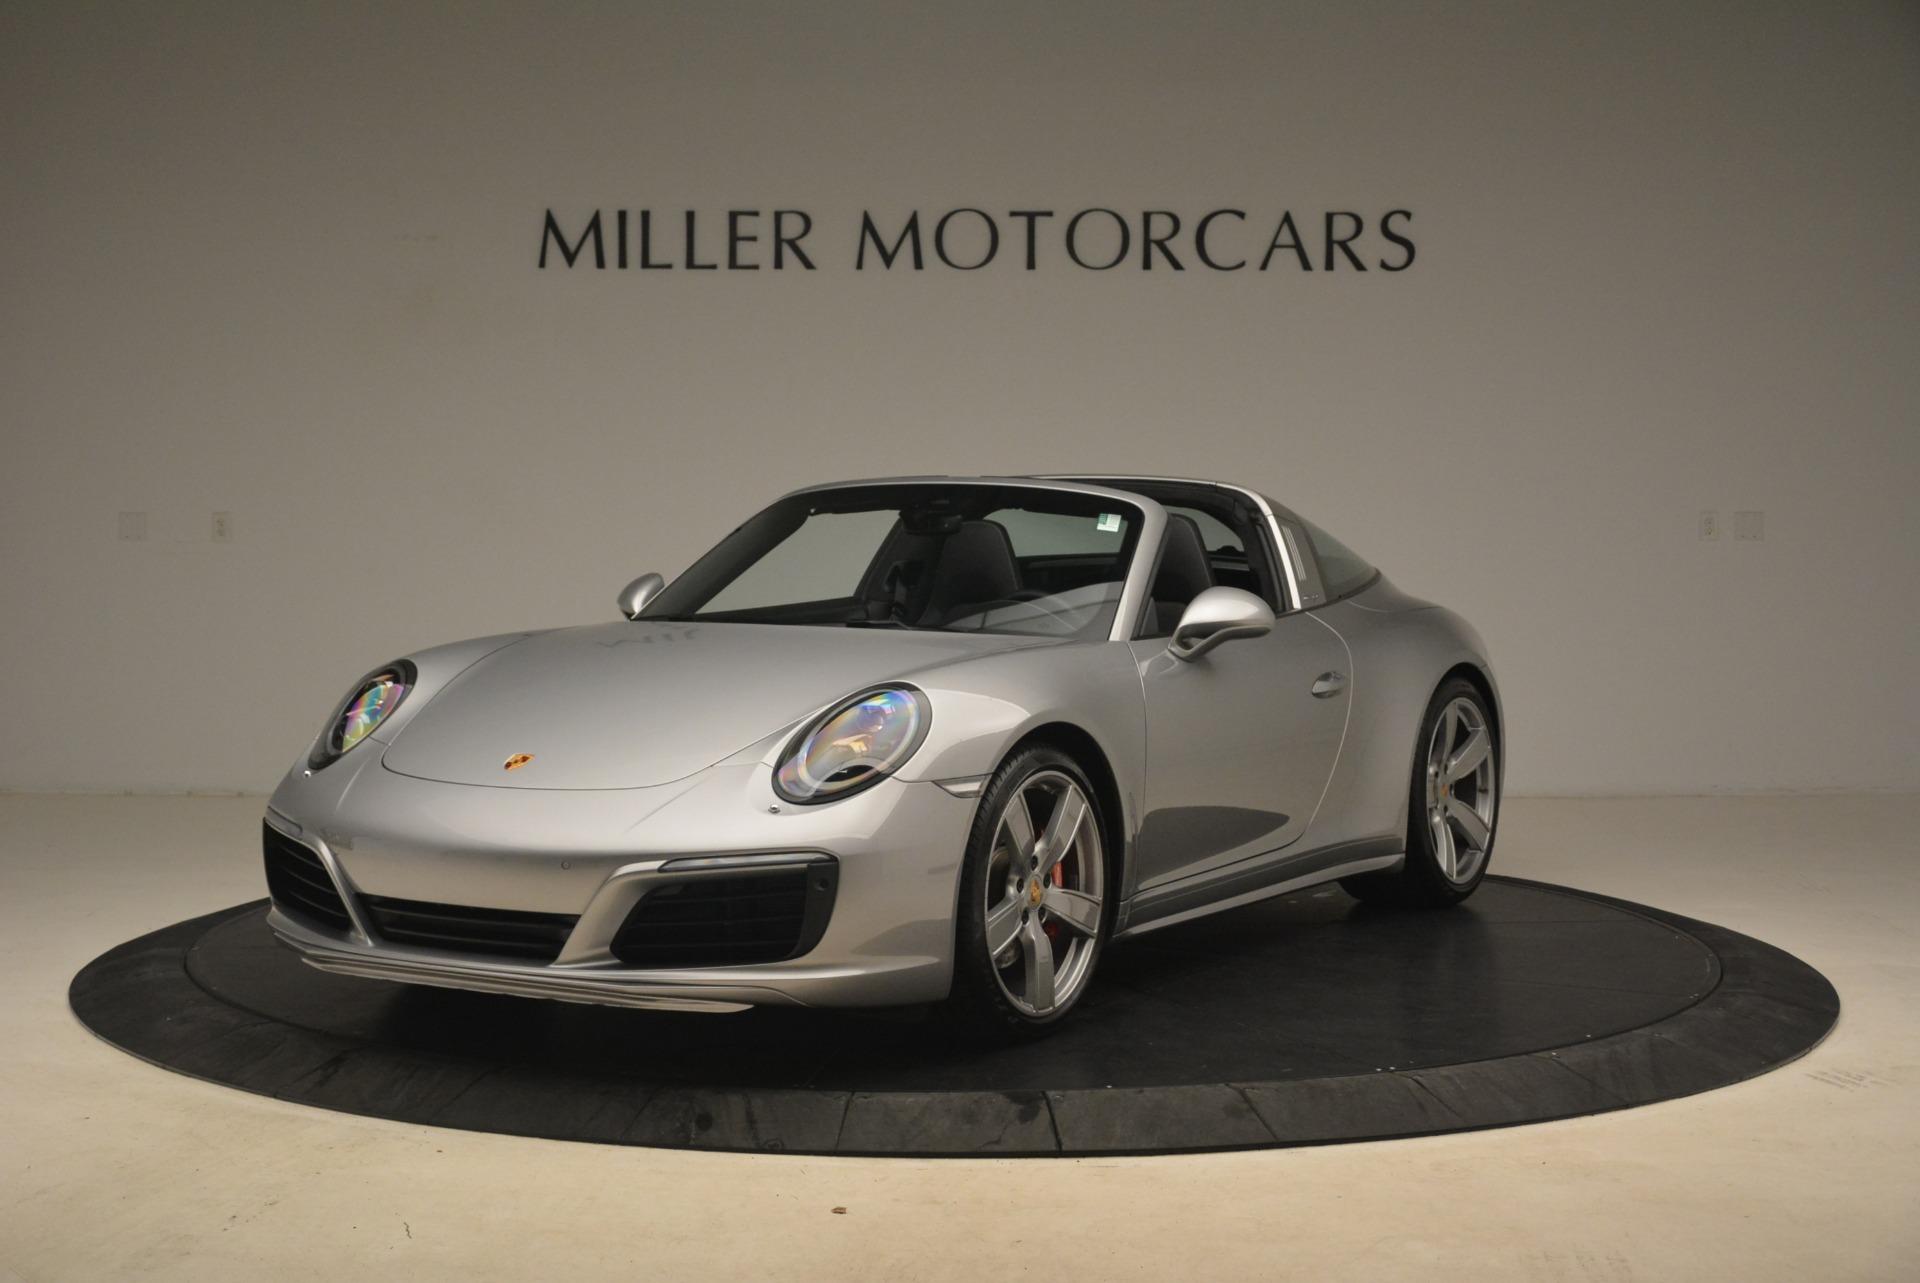 Used 2017 Porsche 911 Targa 4S for sale Sold at Bugatti of Greenwich in Greenwich CT 06830 1